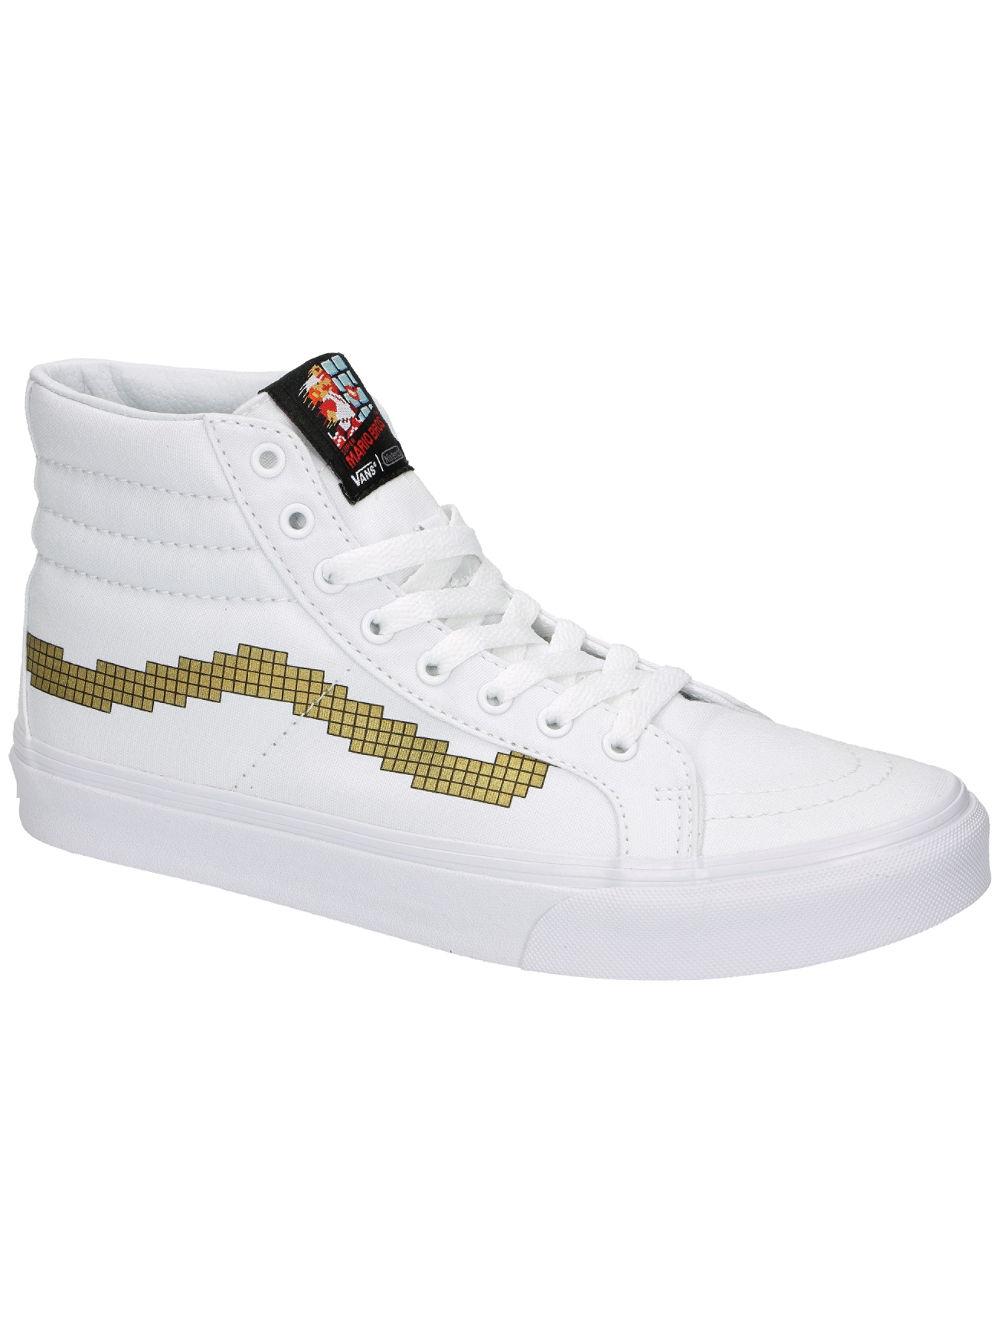 nintendo-sk8-hi-slim-console-gold-sneakers